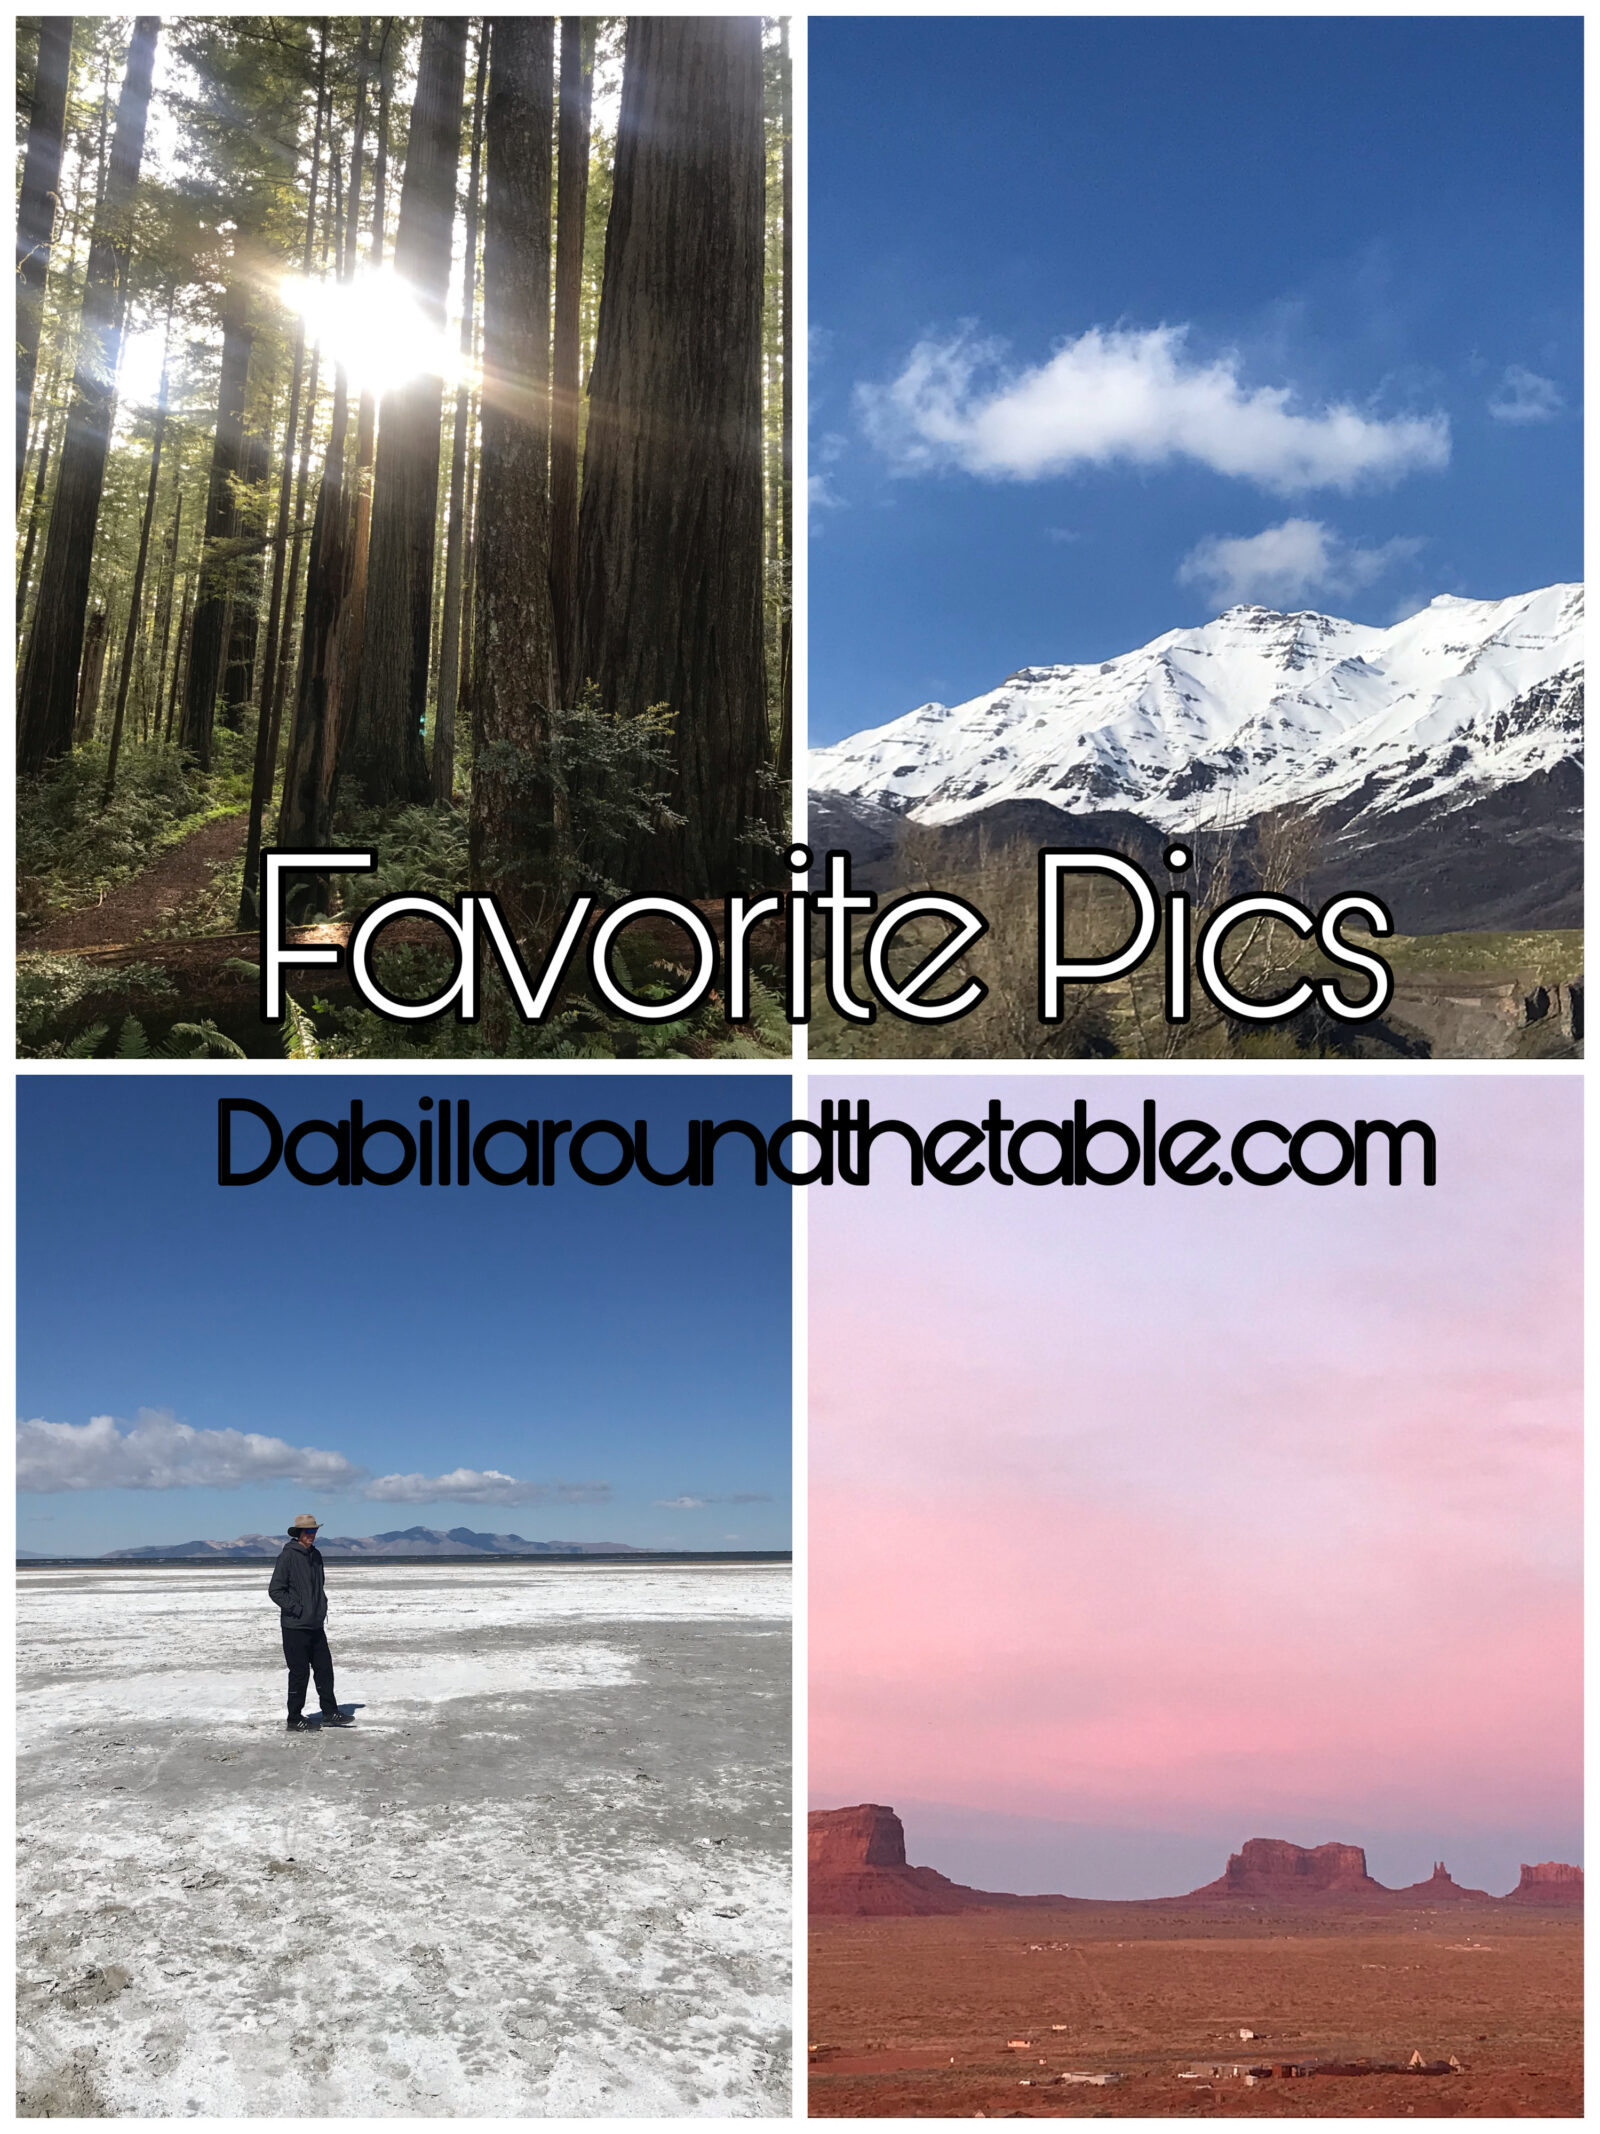 Favorite pics